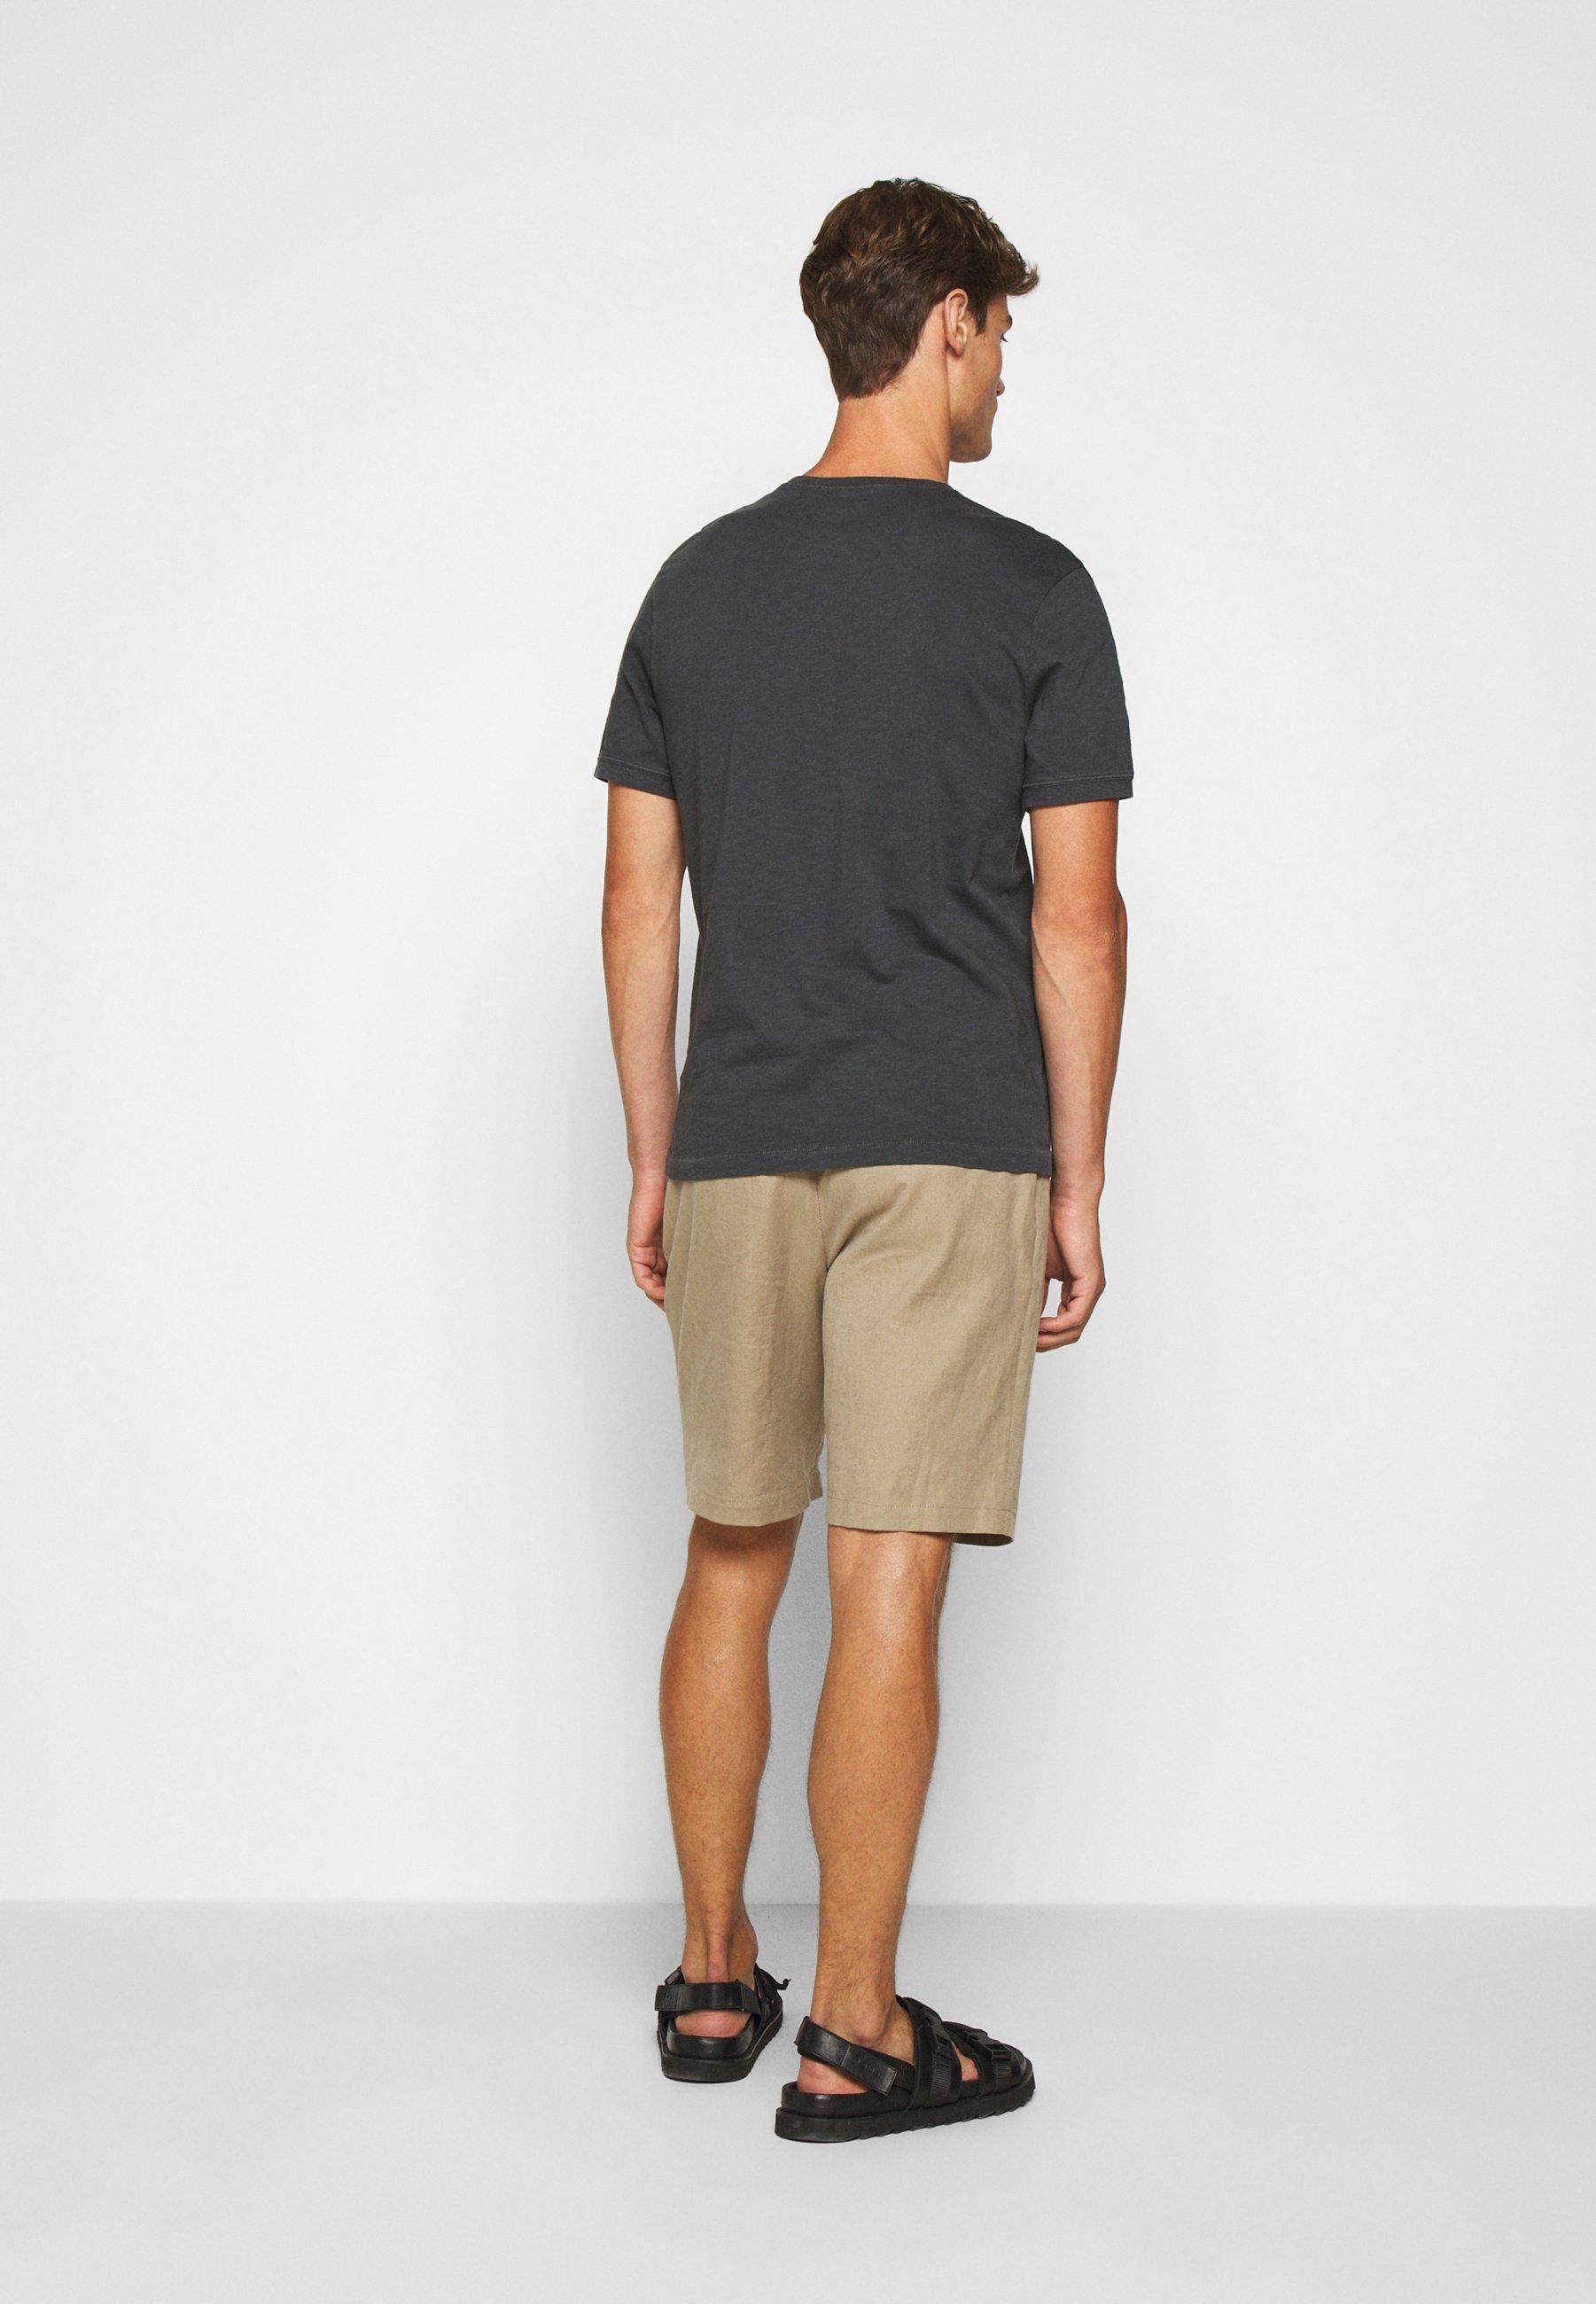 J.CREW GARMENT DYE HENLEY - T-shirt basic - black - Odzież męska Tani